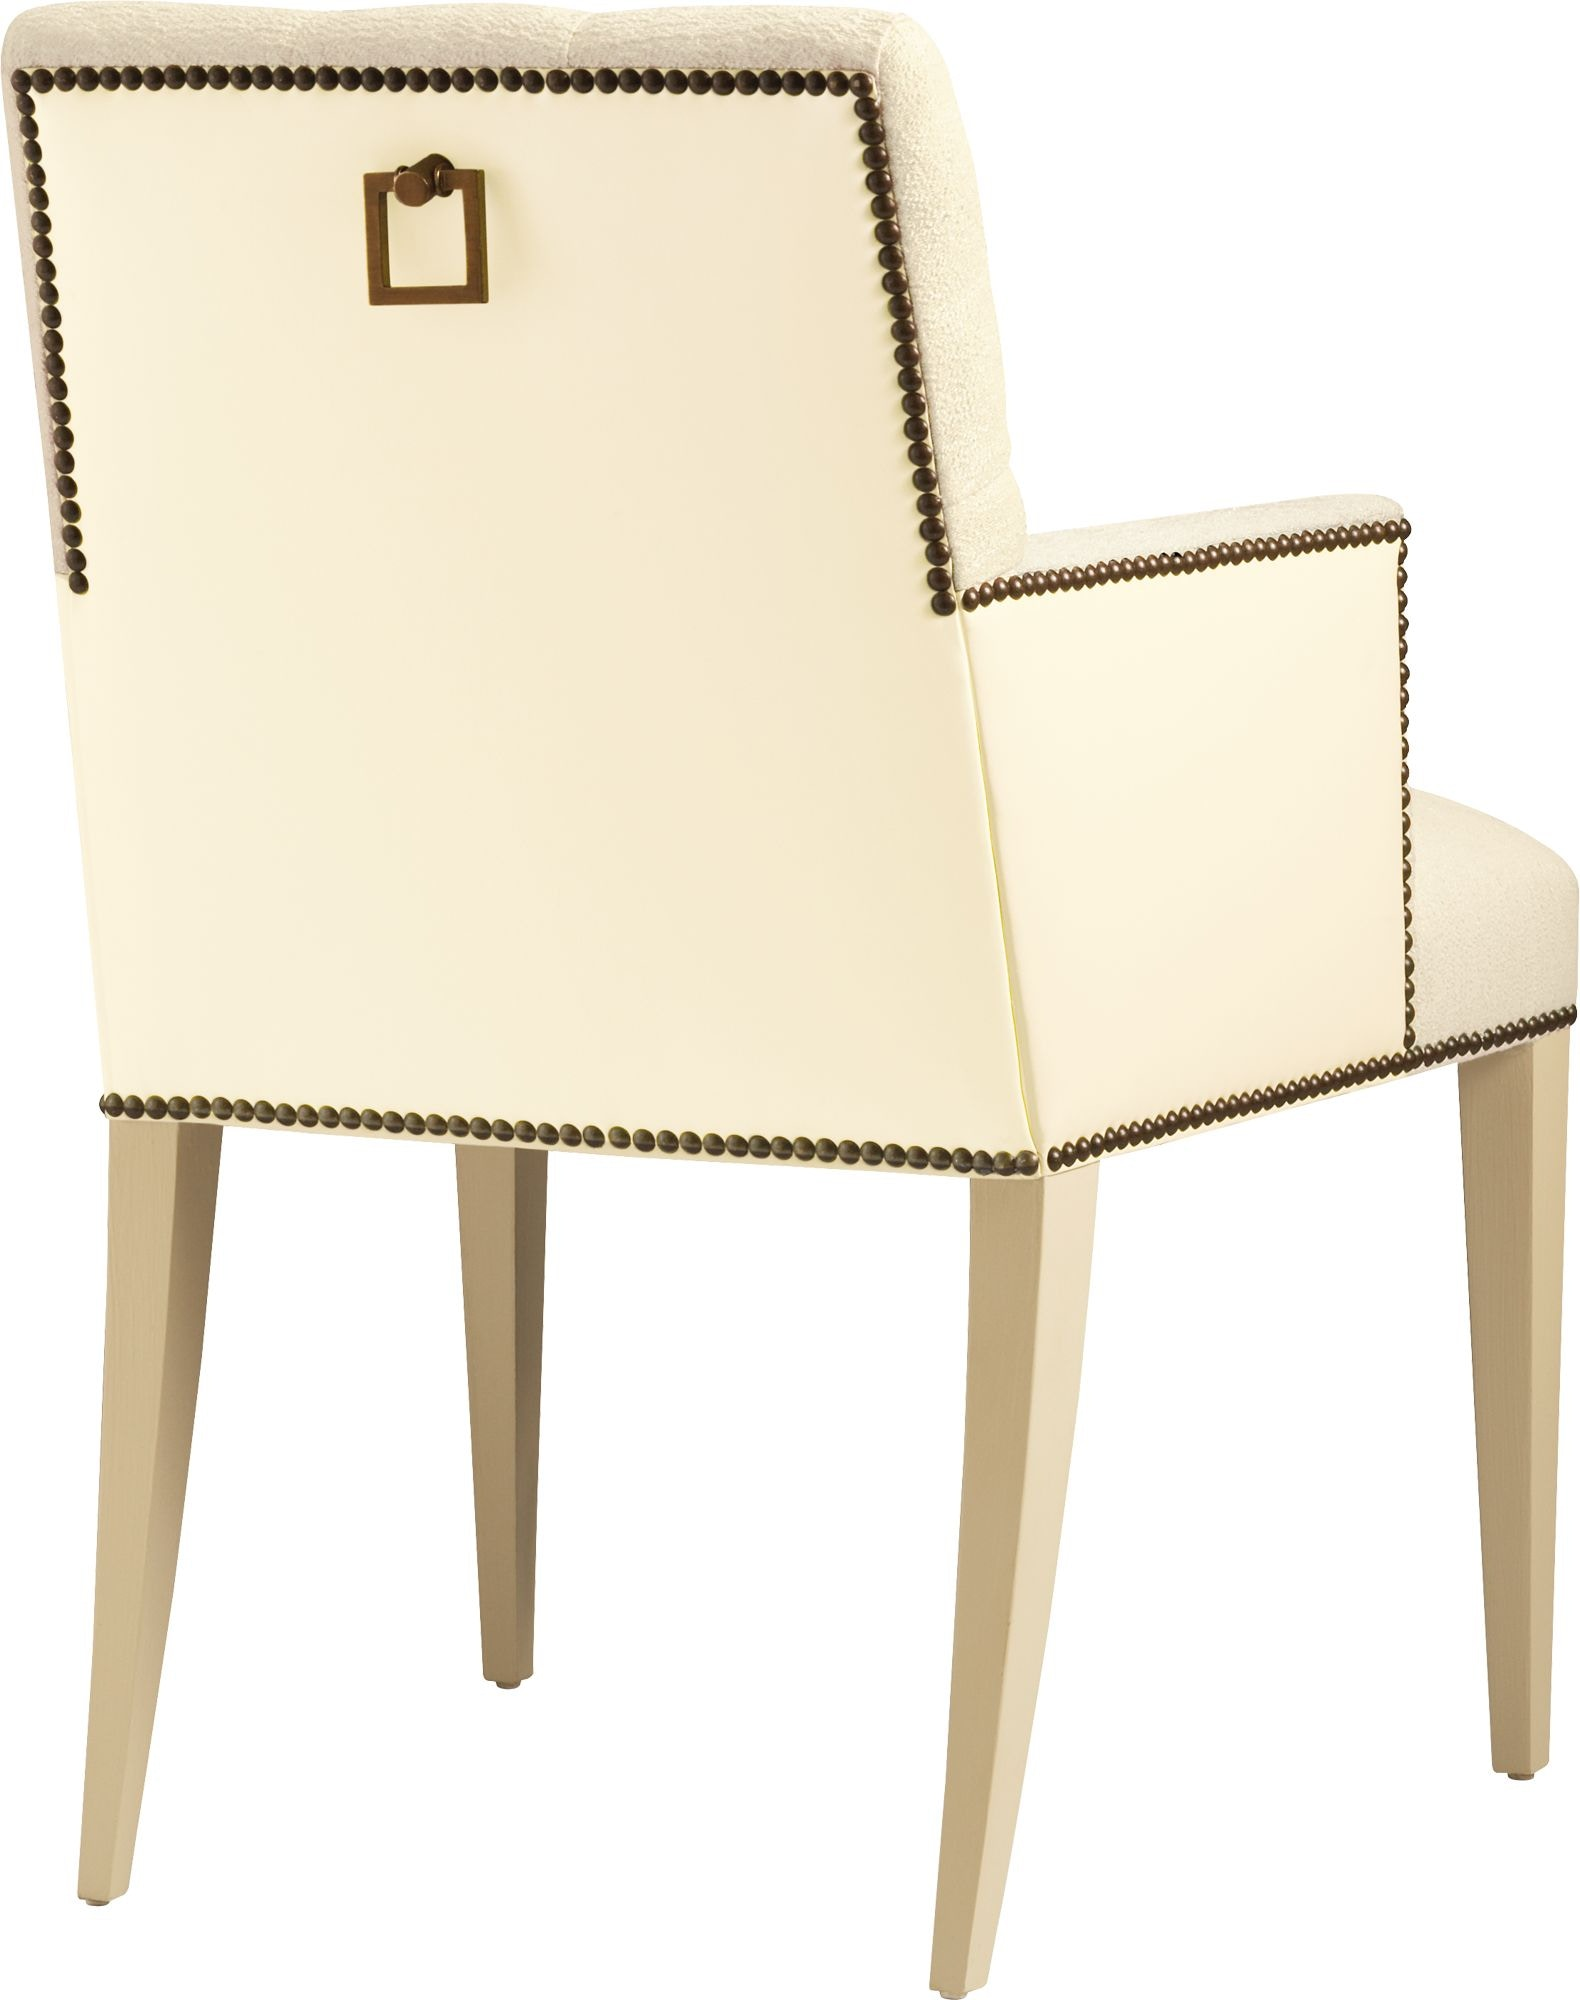 Elegant Baker Furniture Thomas Pheasant St. Germain Arm Chair 7847